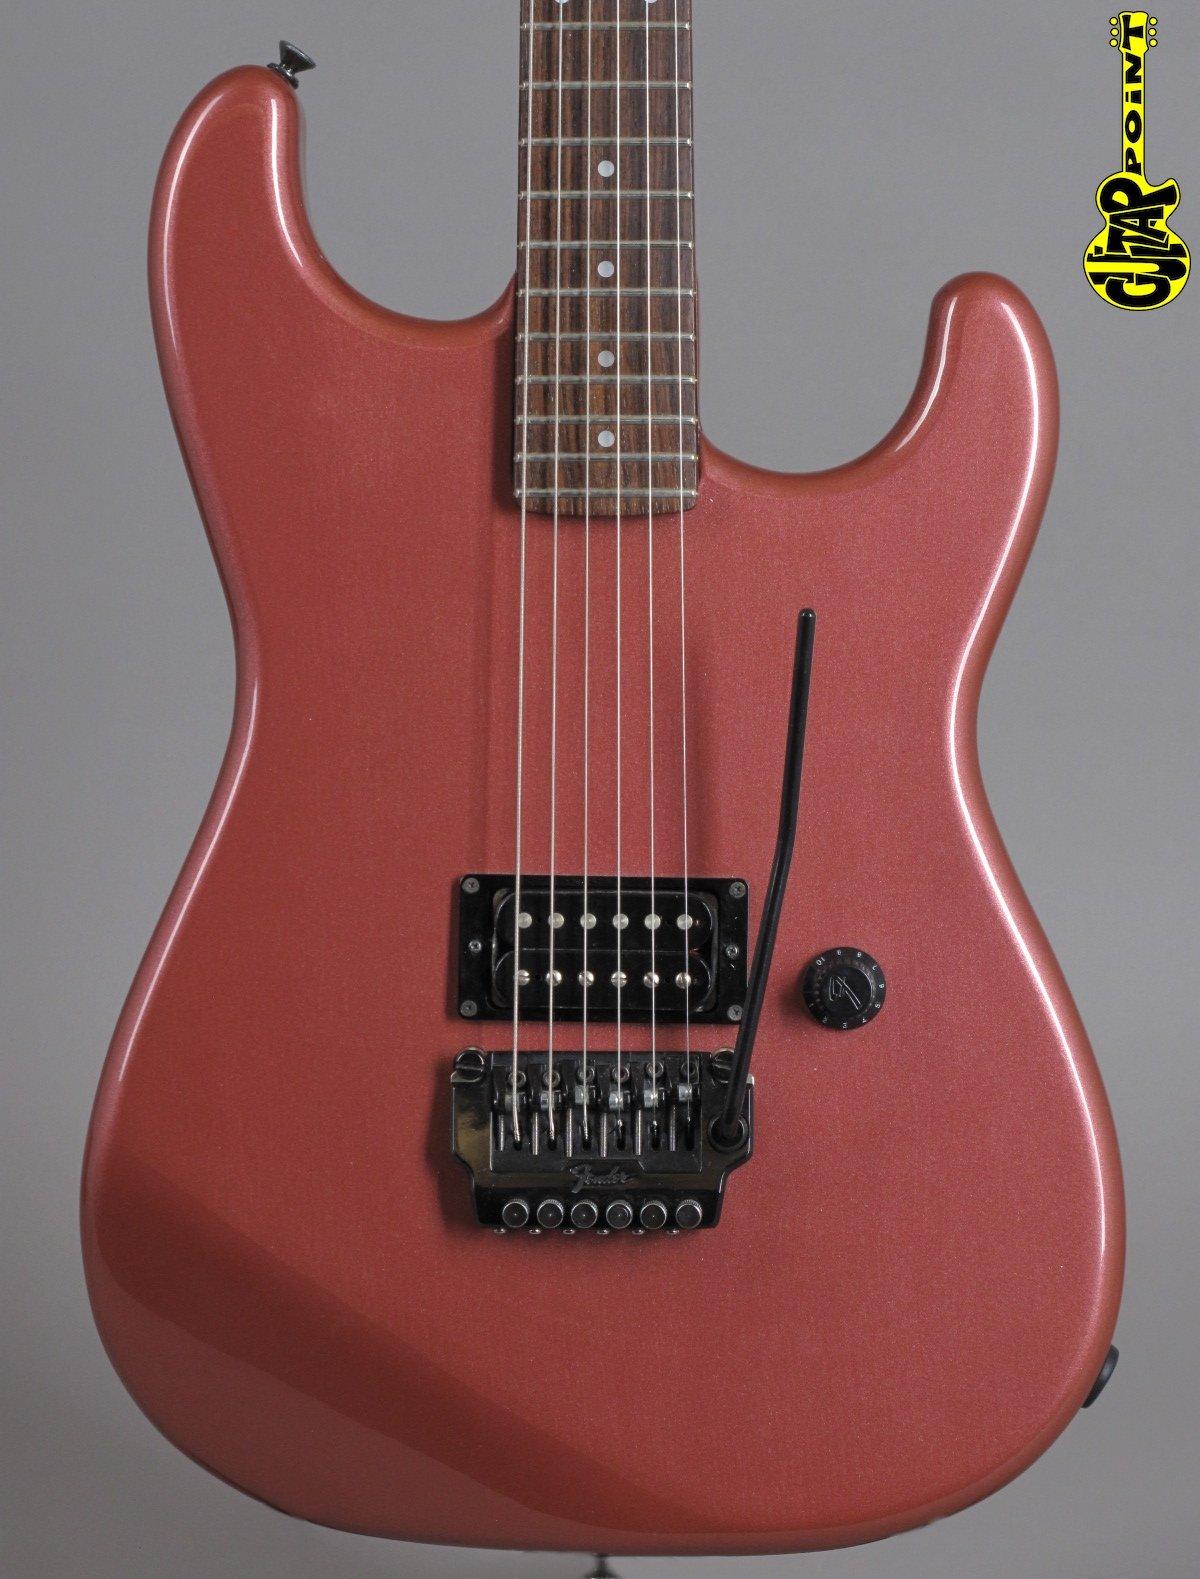 1985 Fender HM Stratocaster - Burgundy Mist Metallic